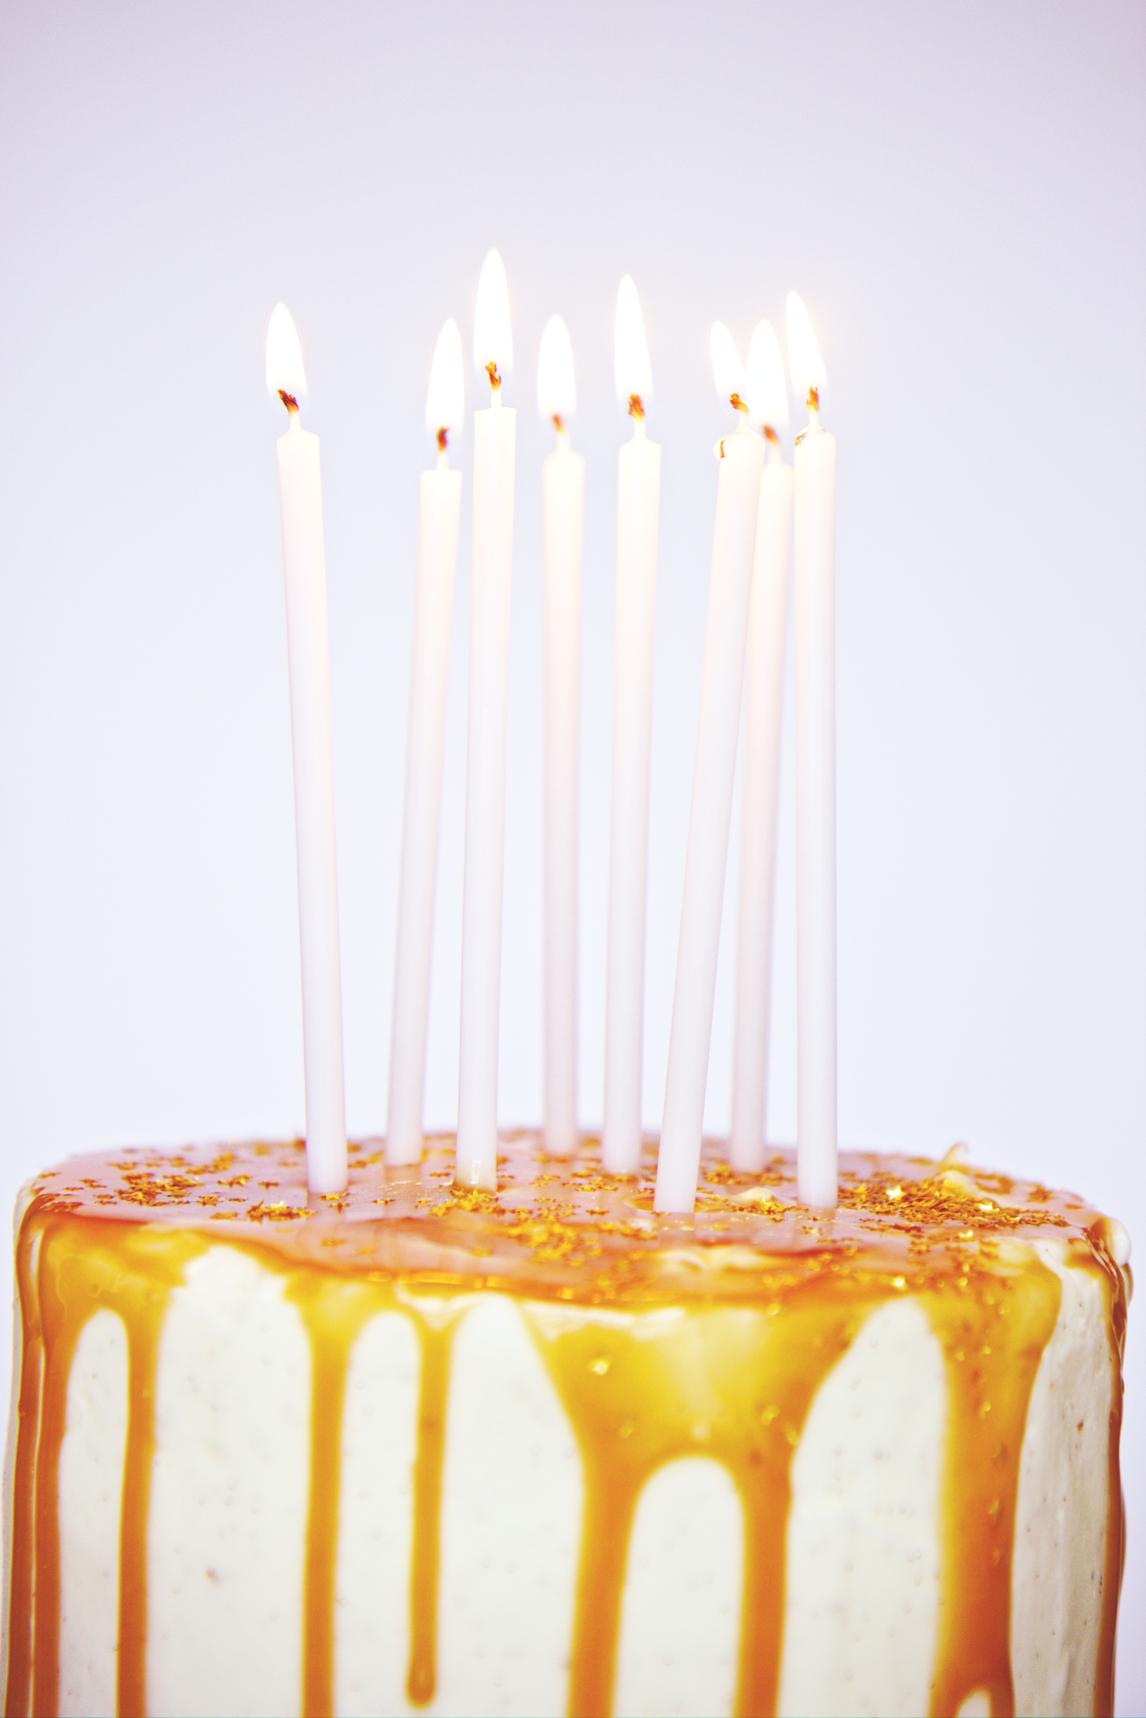 White Chocolate and Caramel Almond Cake | La Pêche Fraîche